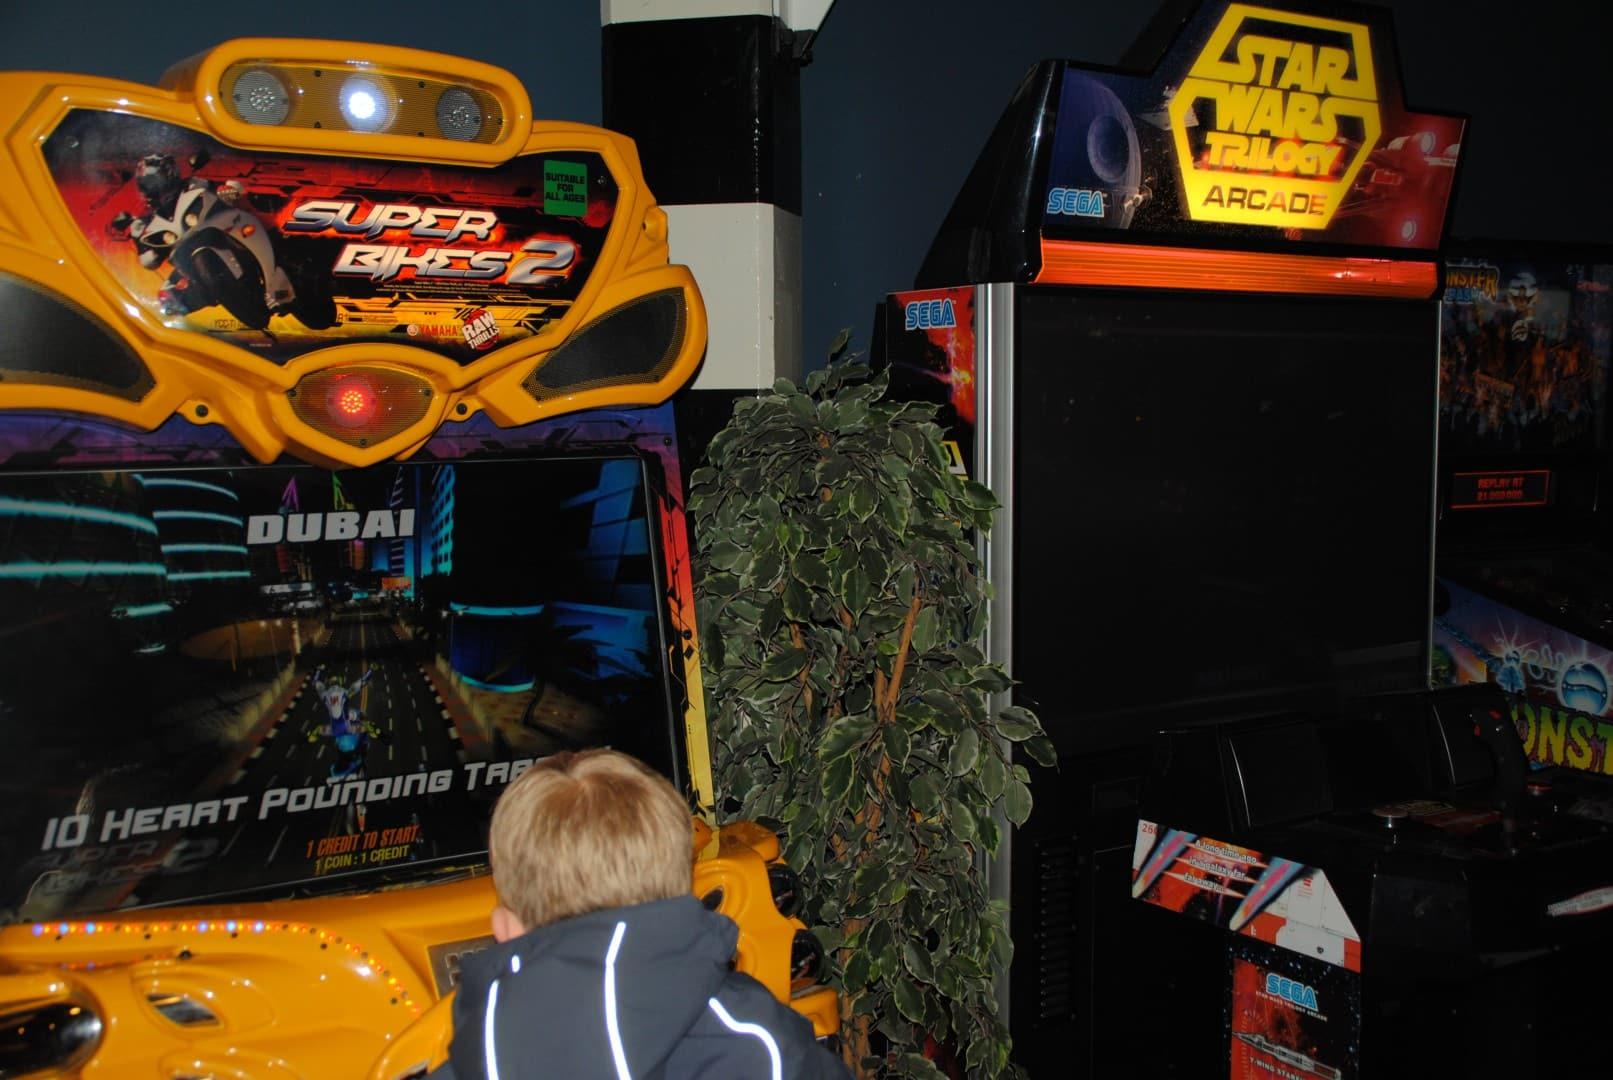 Super bikes 2 and STAR WARS TRILOGY Arcade / At Liseberg Fun Fair